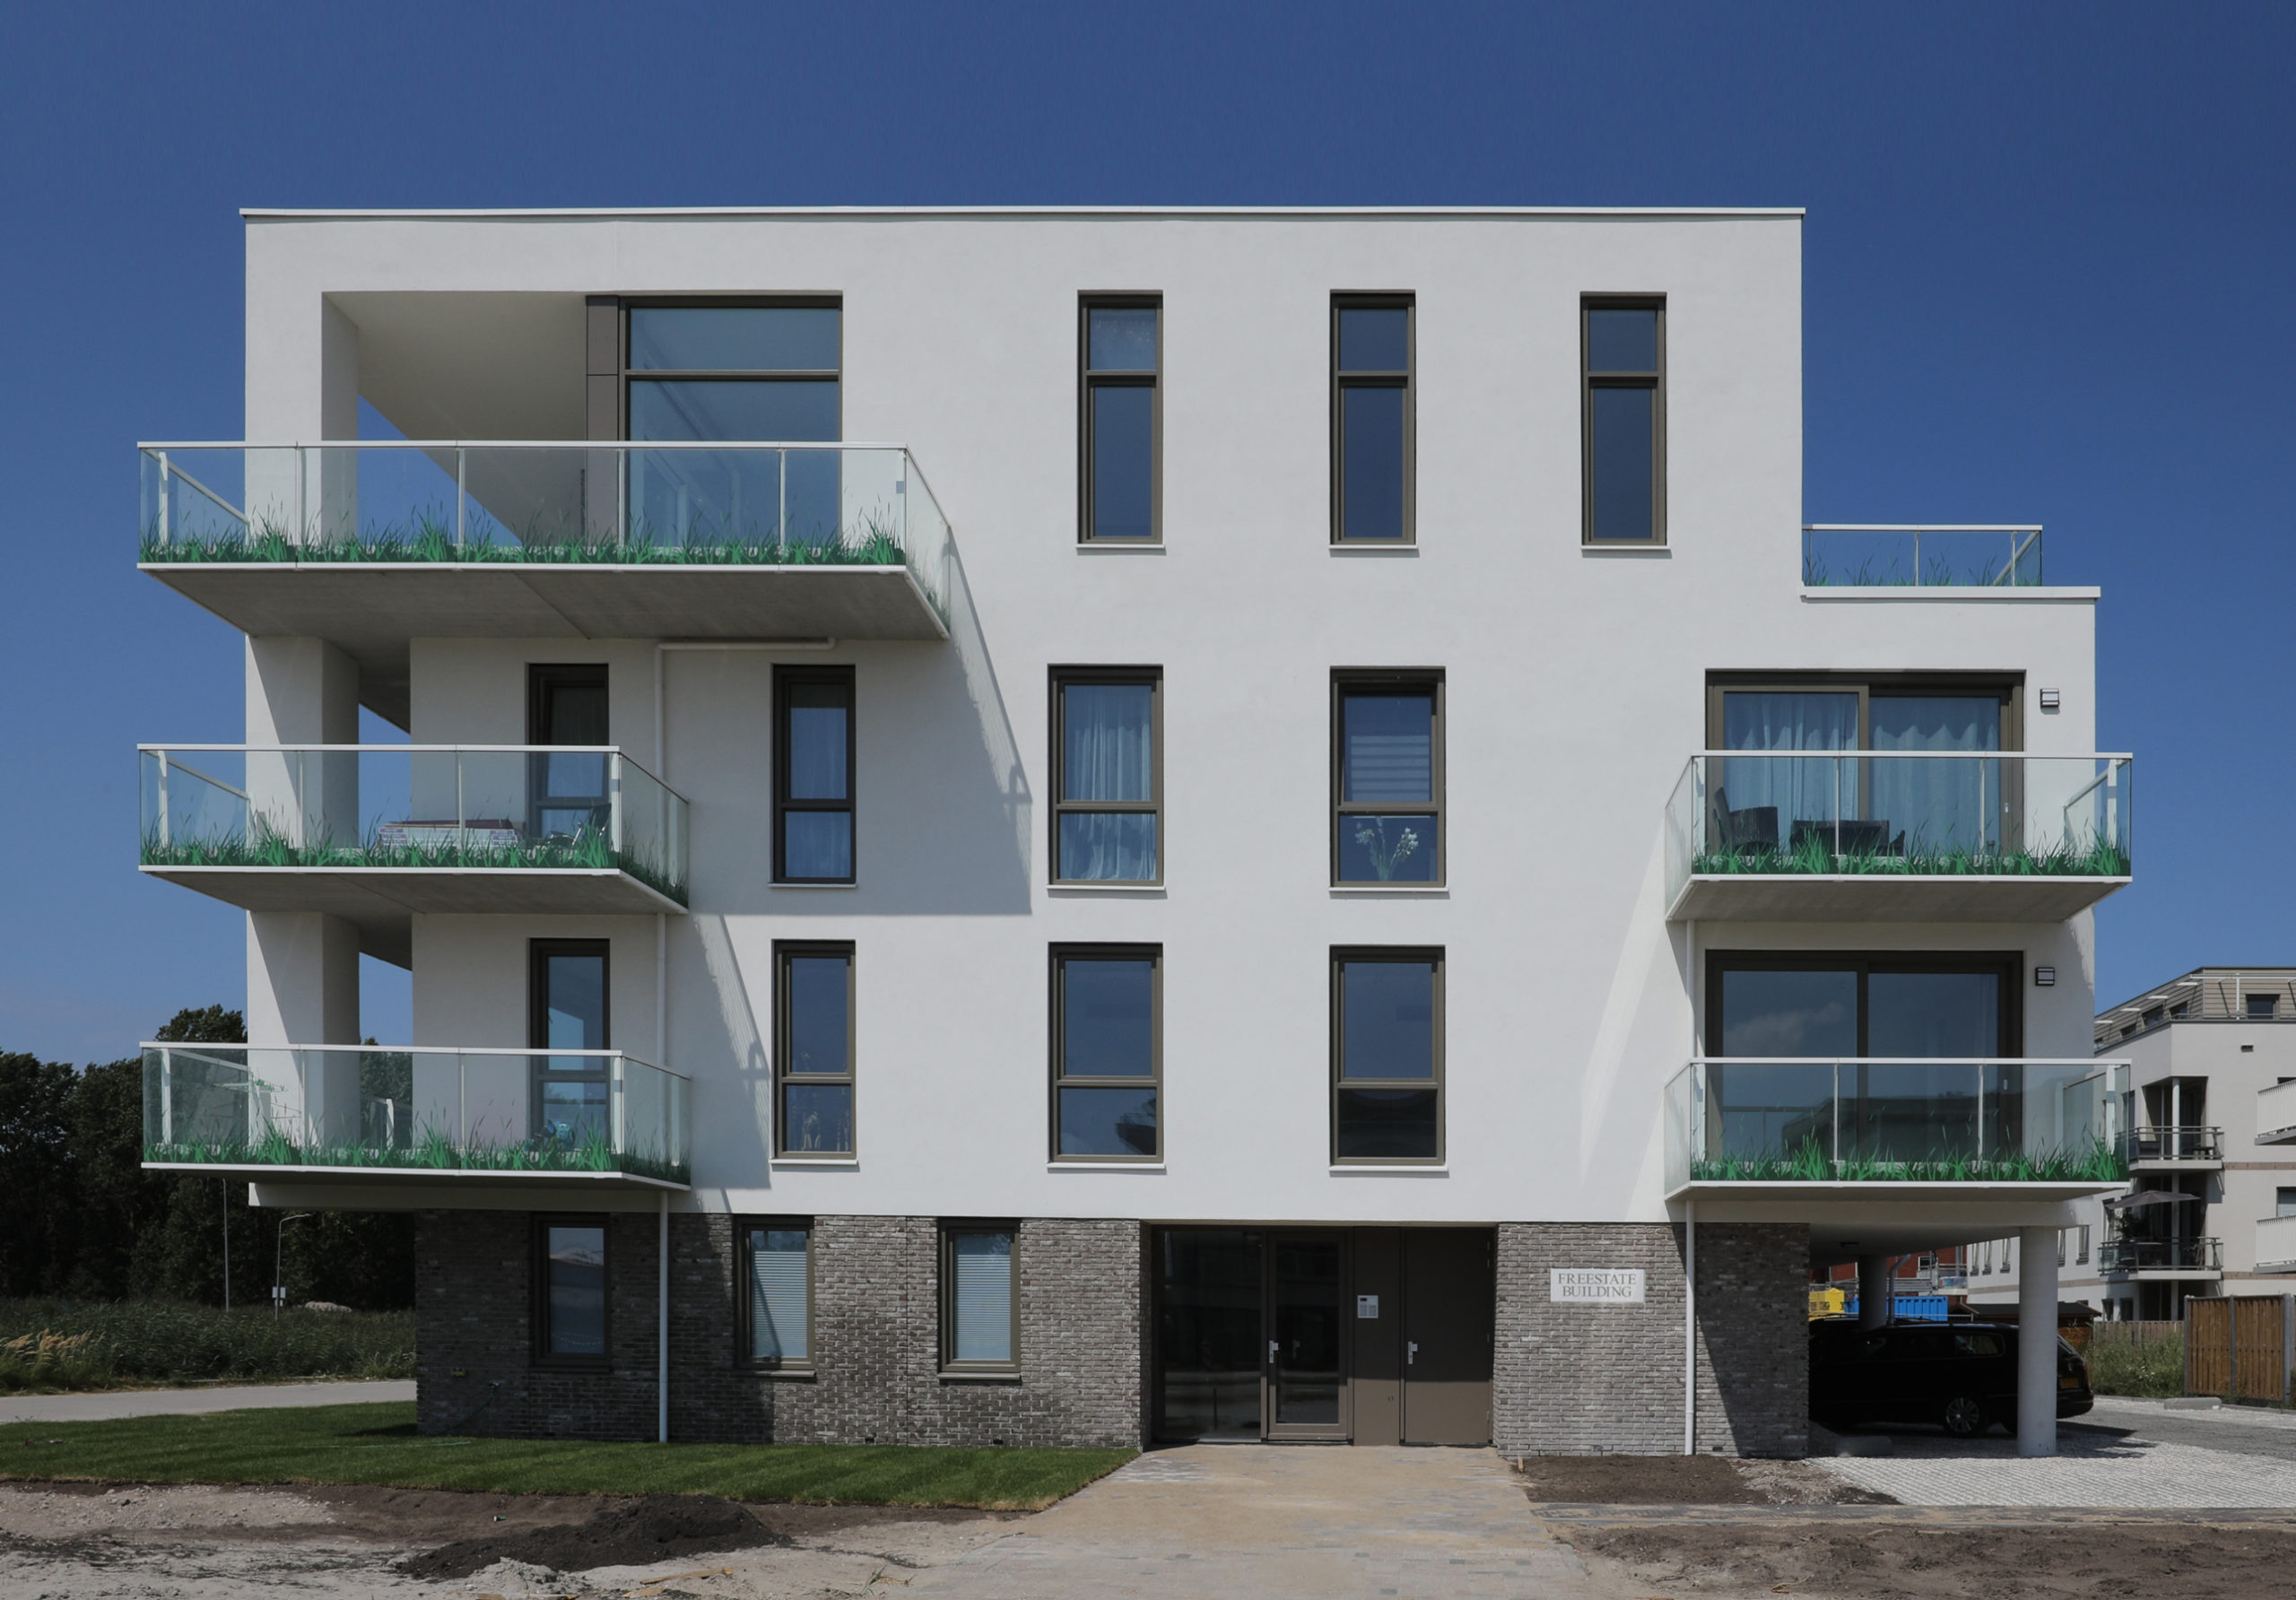 Appartementen complex Freestate Building Almere Poort   Olof Architects